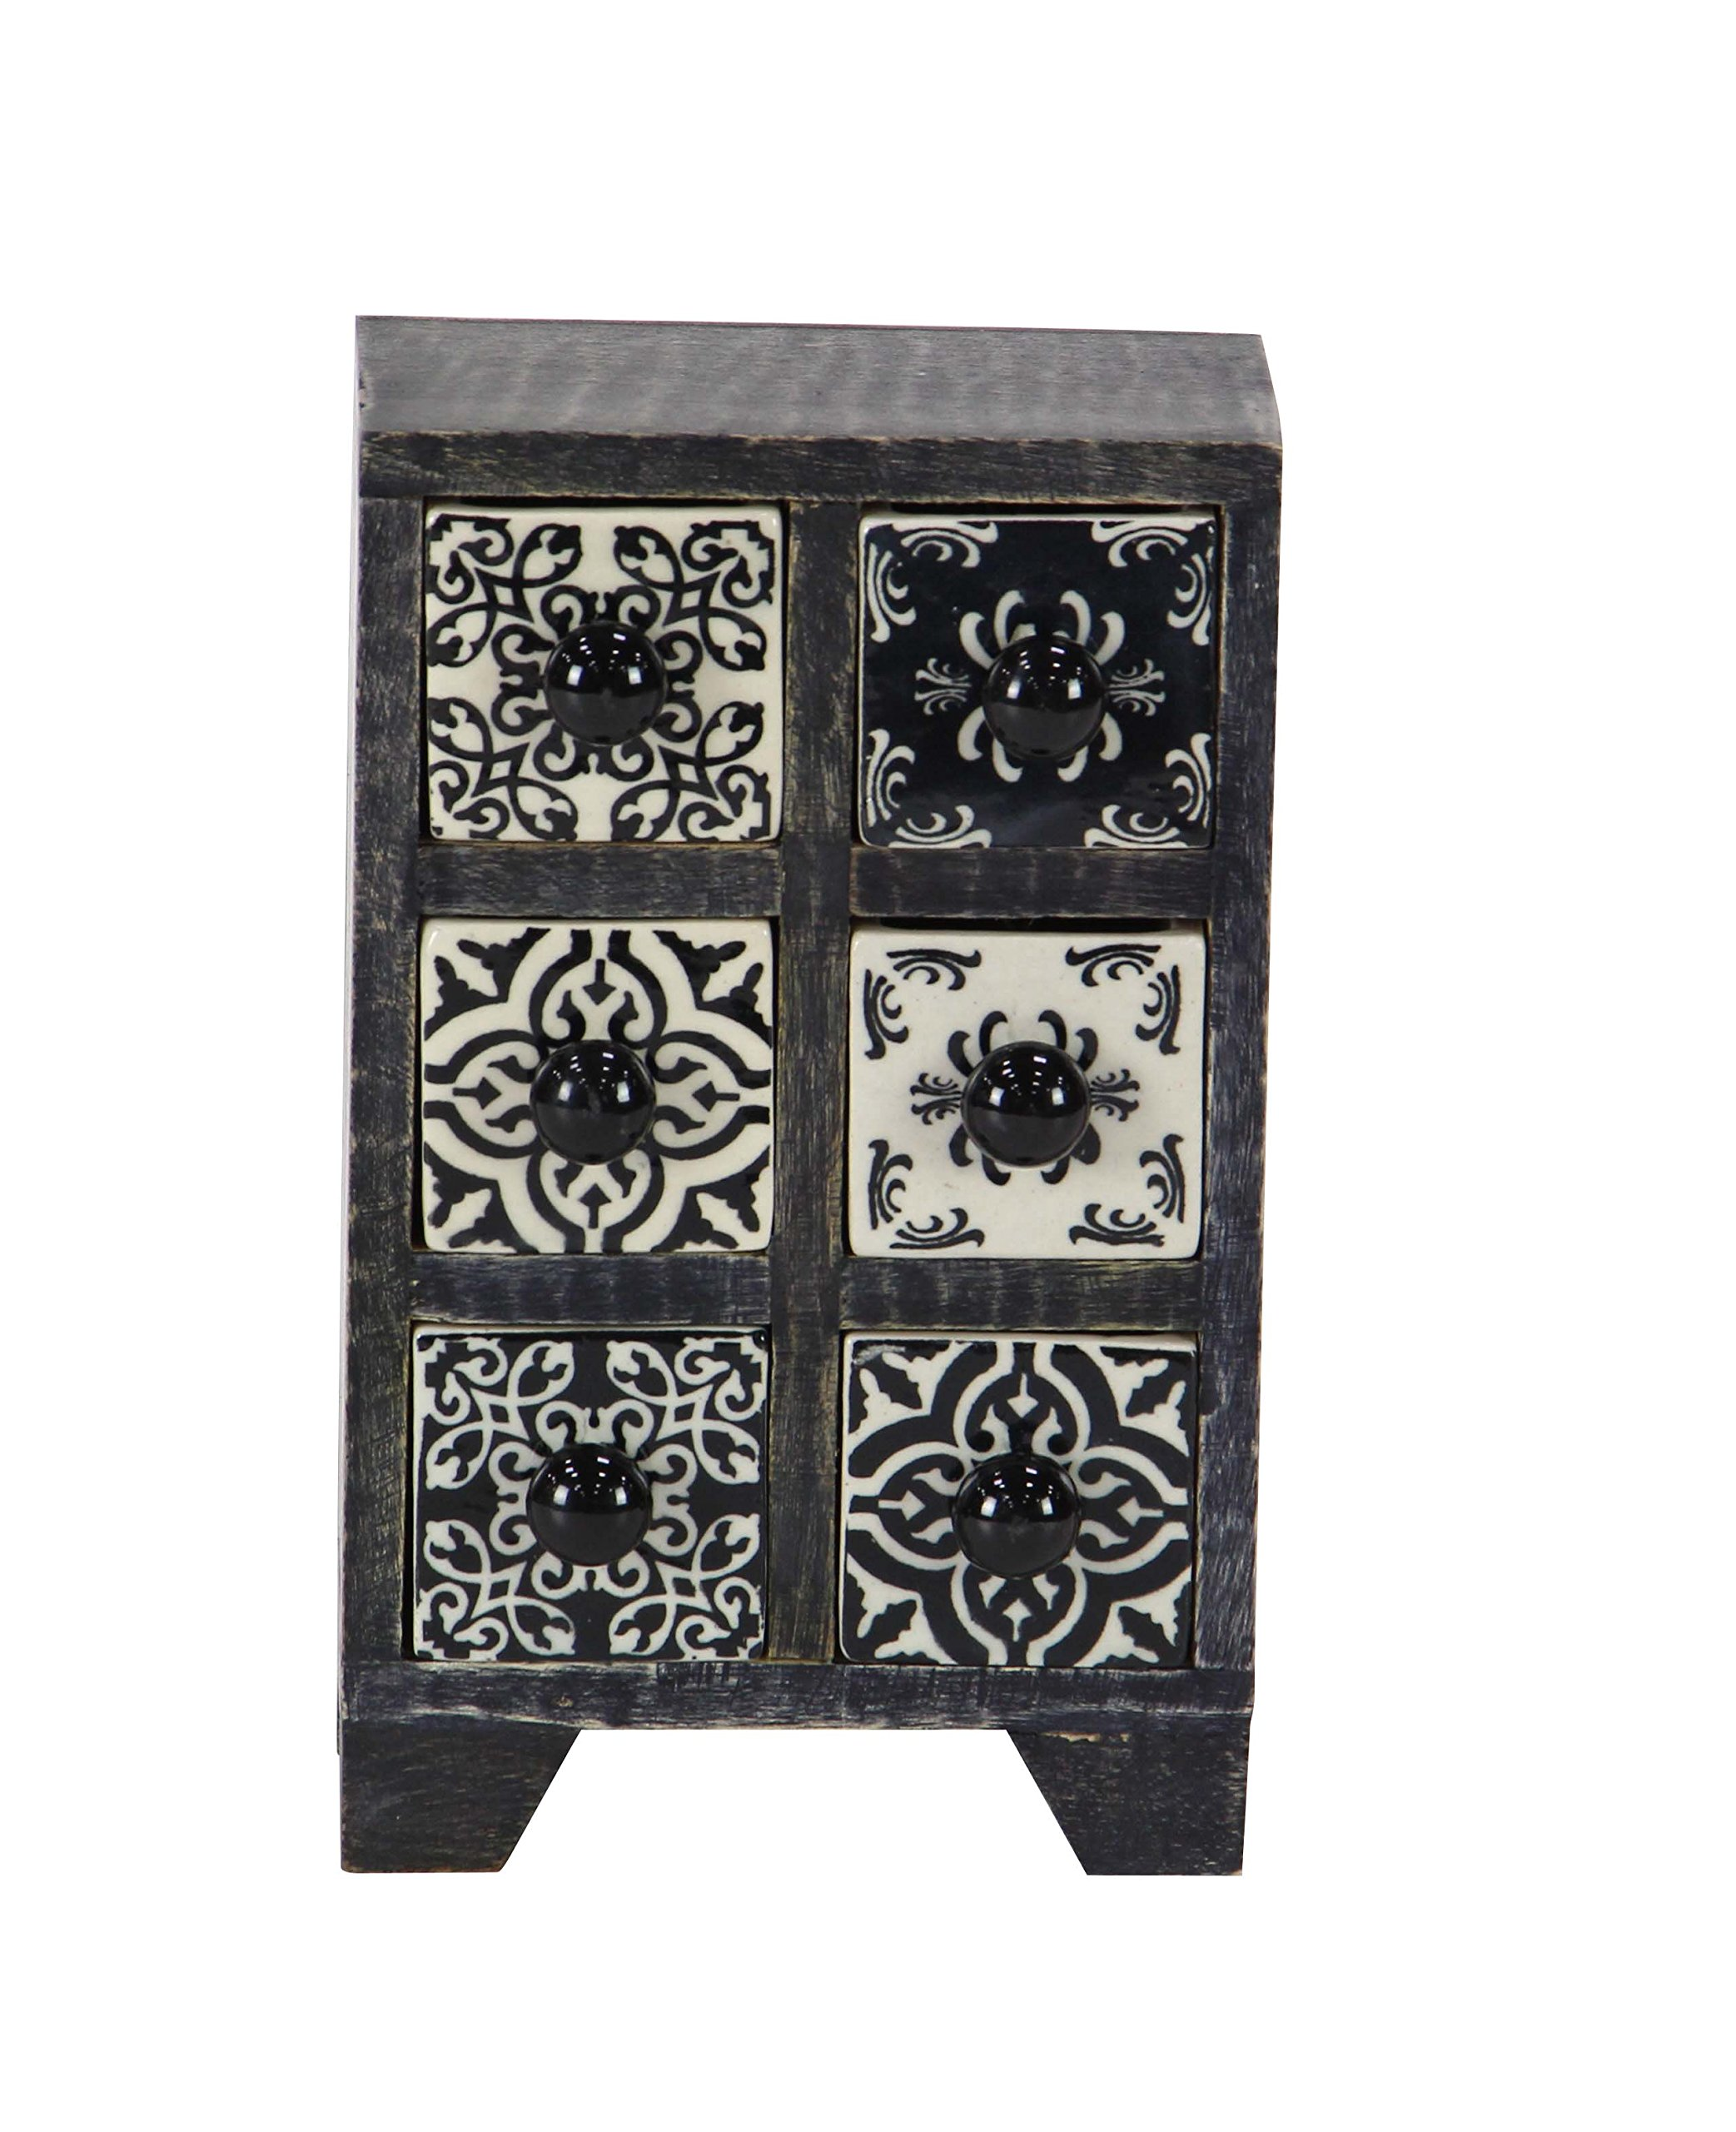 Deco 79 86376 Jewelry Box, Black/White